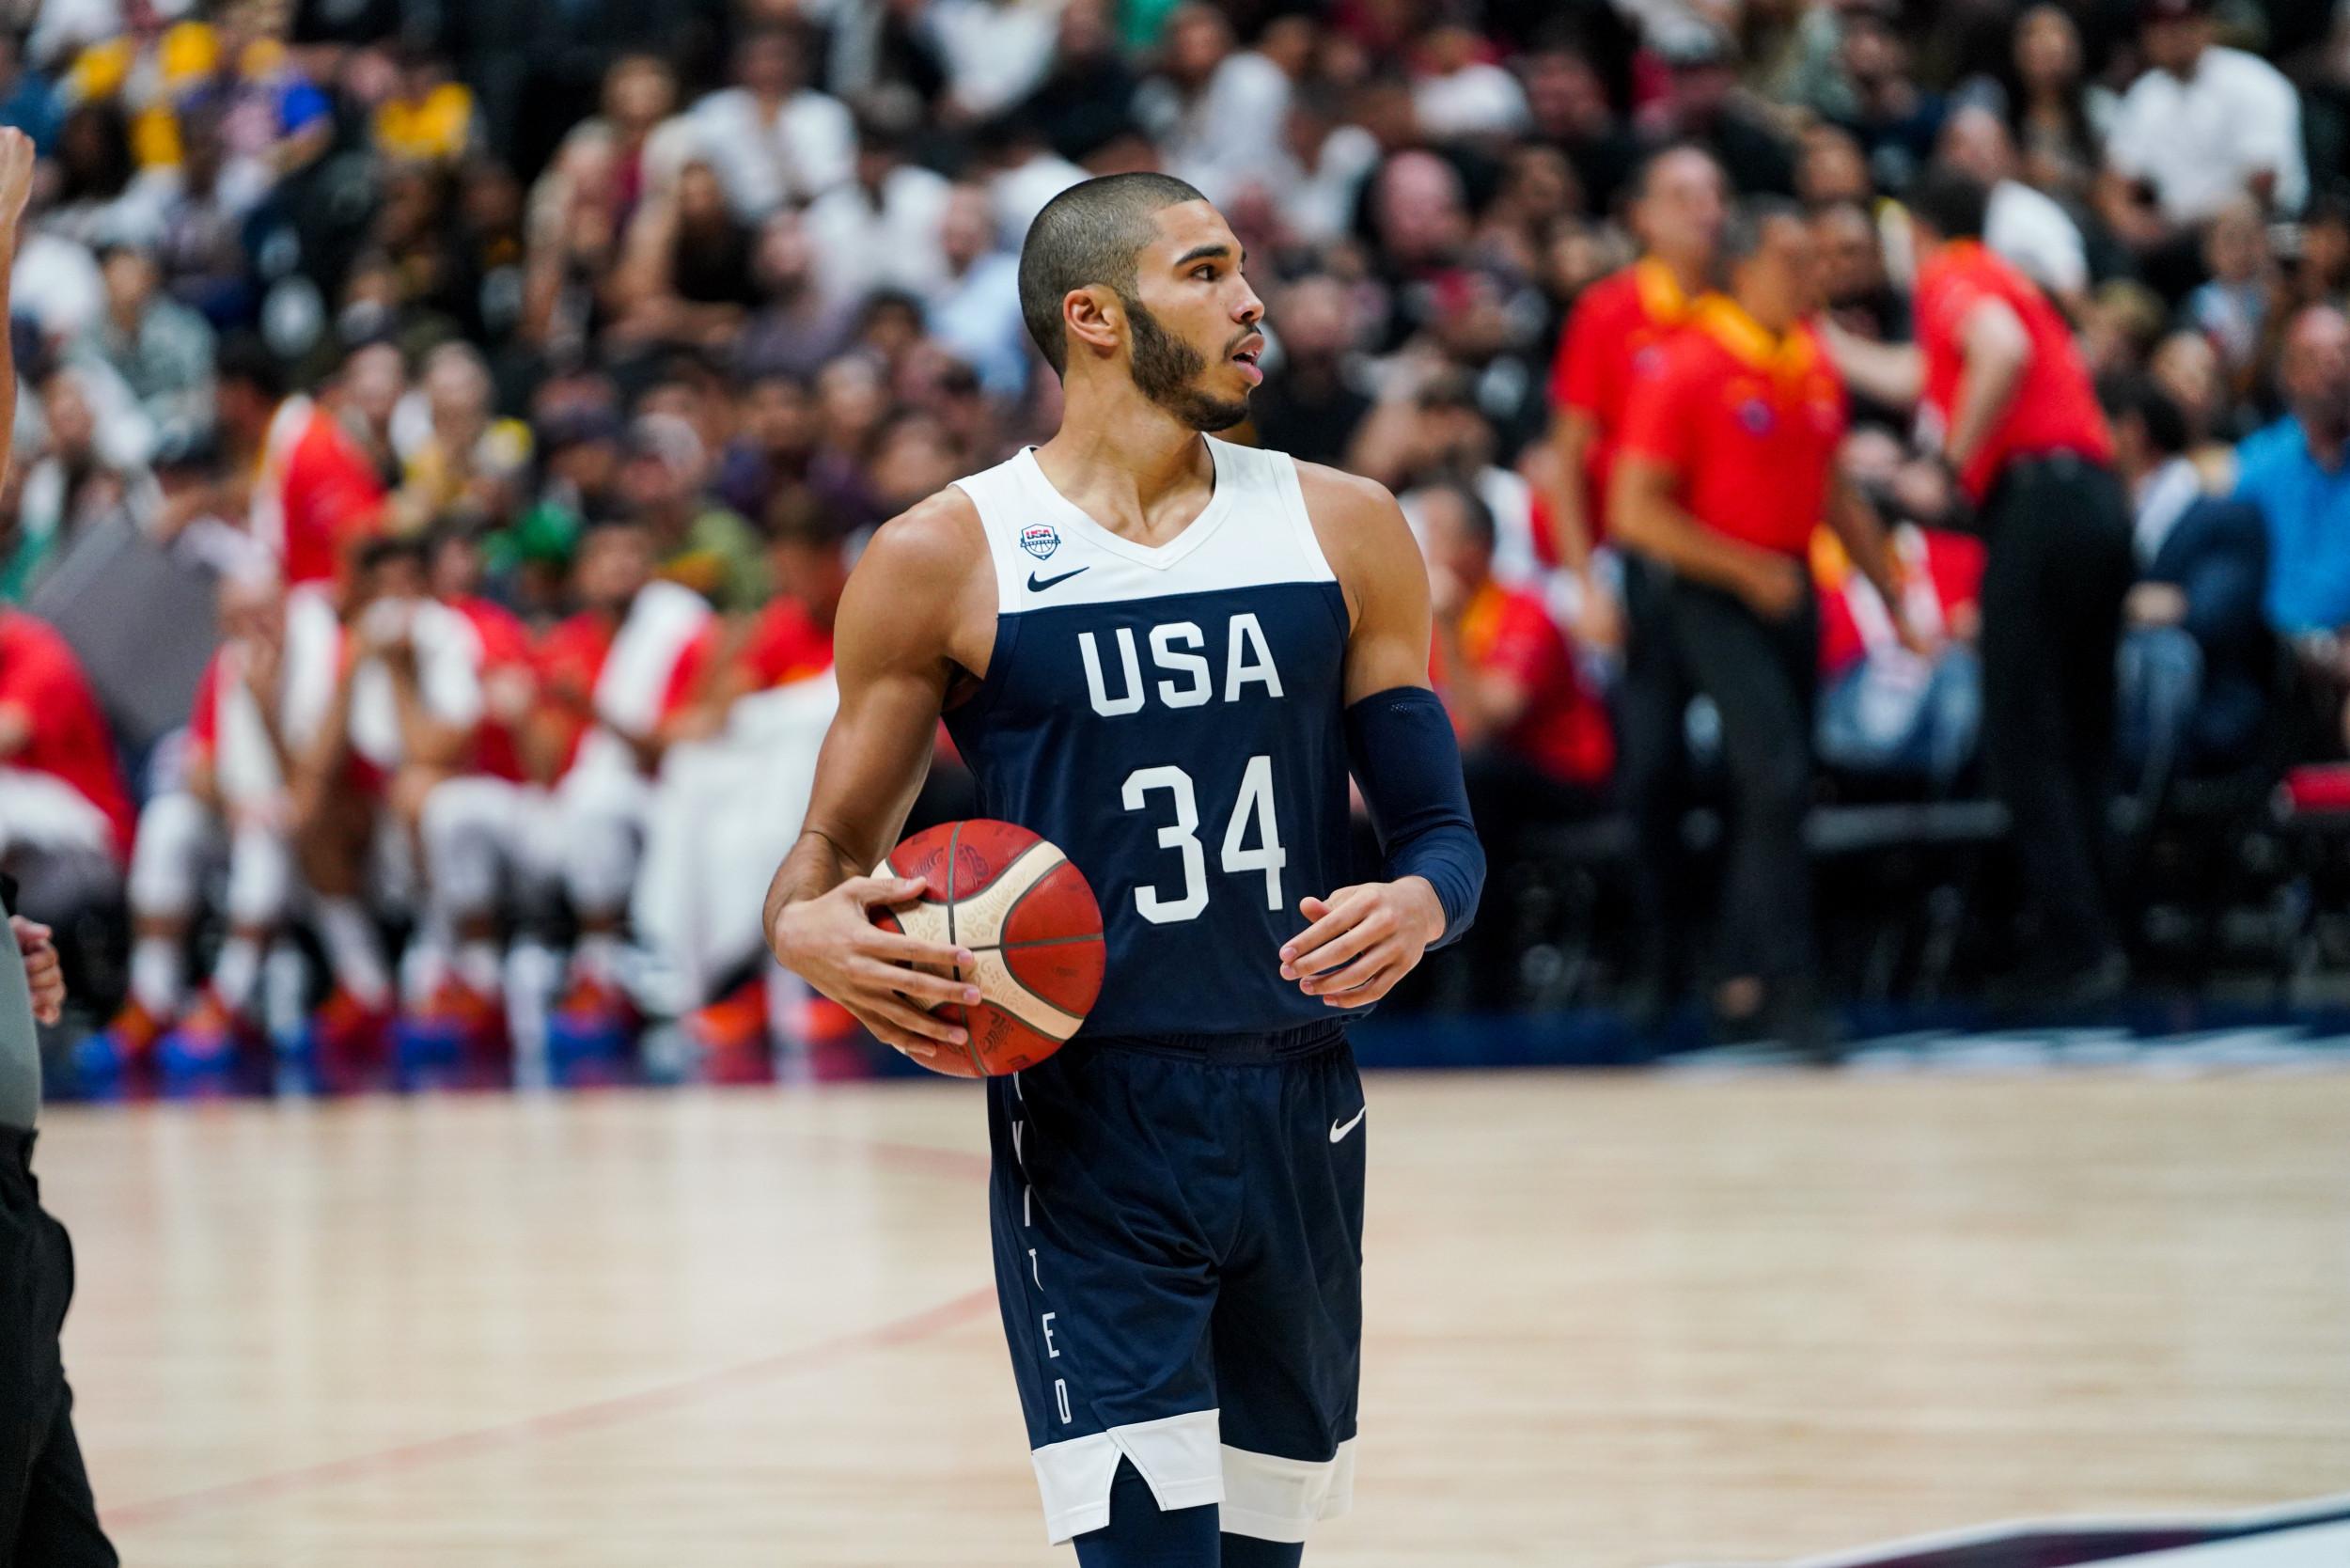 FIBA Basketball World Cup 2019 Latest Odds: Can Team USA Win